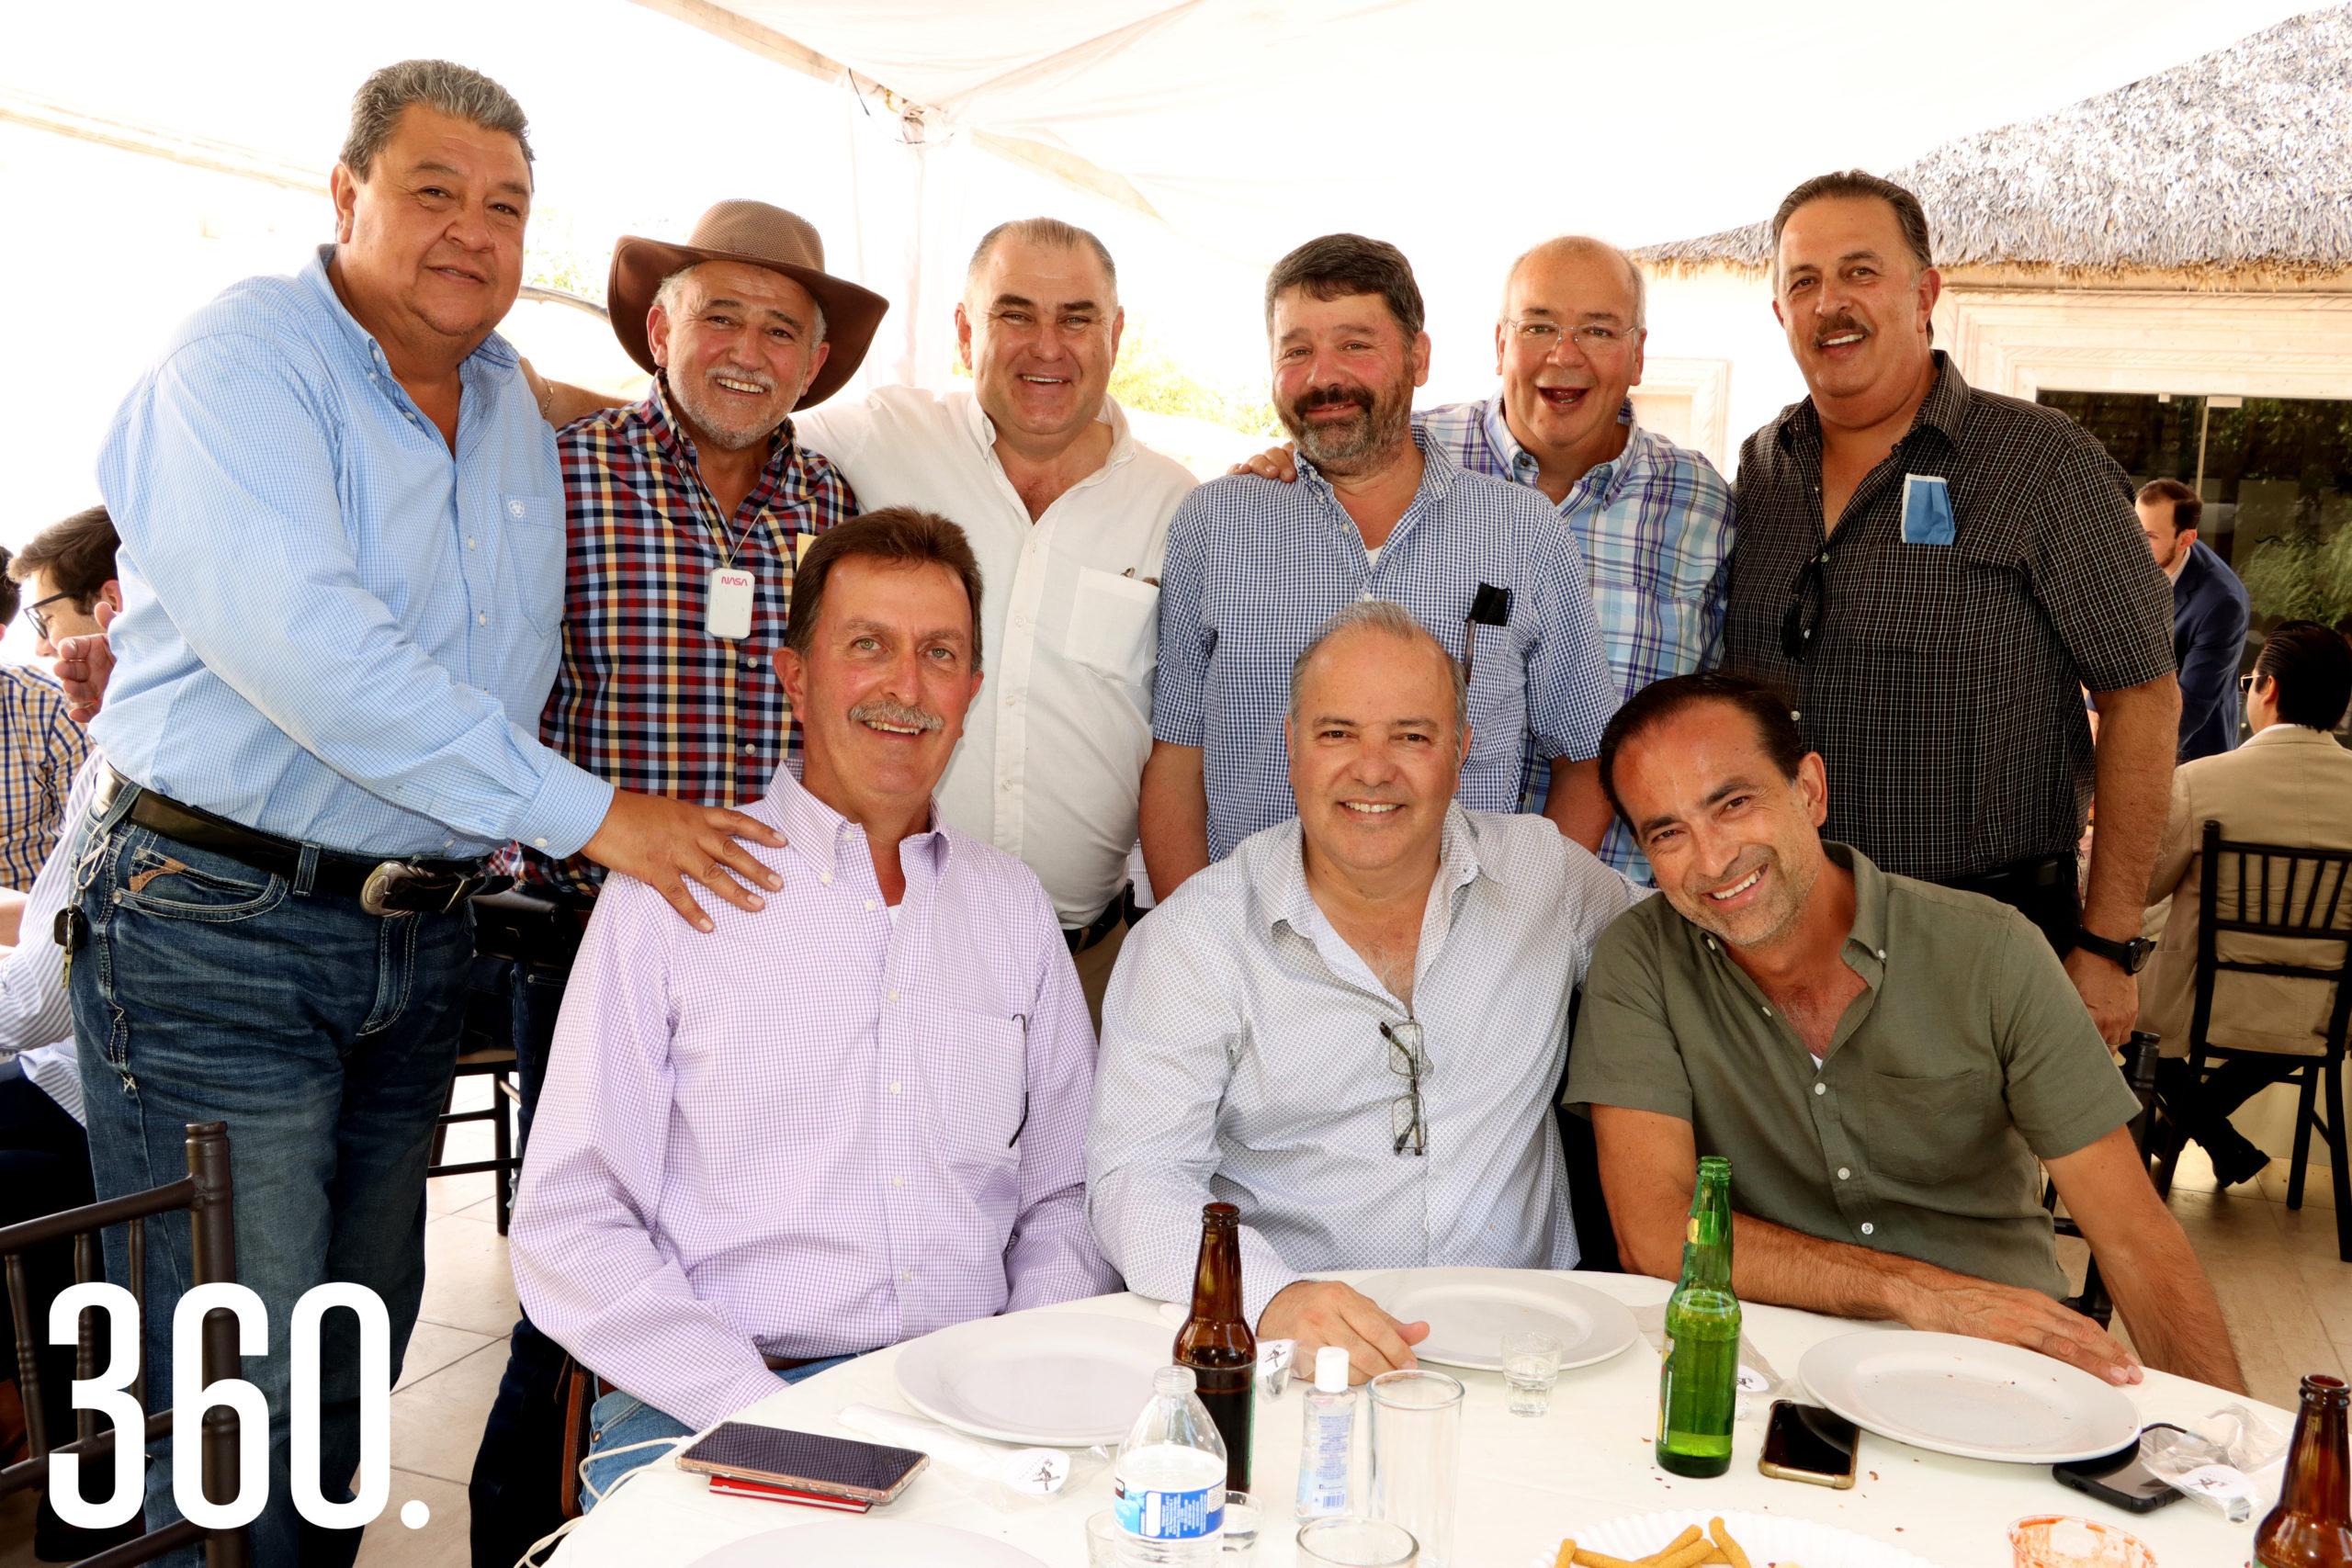 Enrique Alatriste, José Humberto Dávila, José Luis Dávila, Carlos López, Gilberto Mendoza, Alejandro Mendoza, Alejandro Pepi y Eduardo Lara.